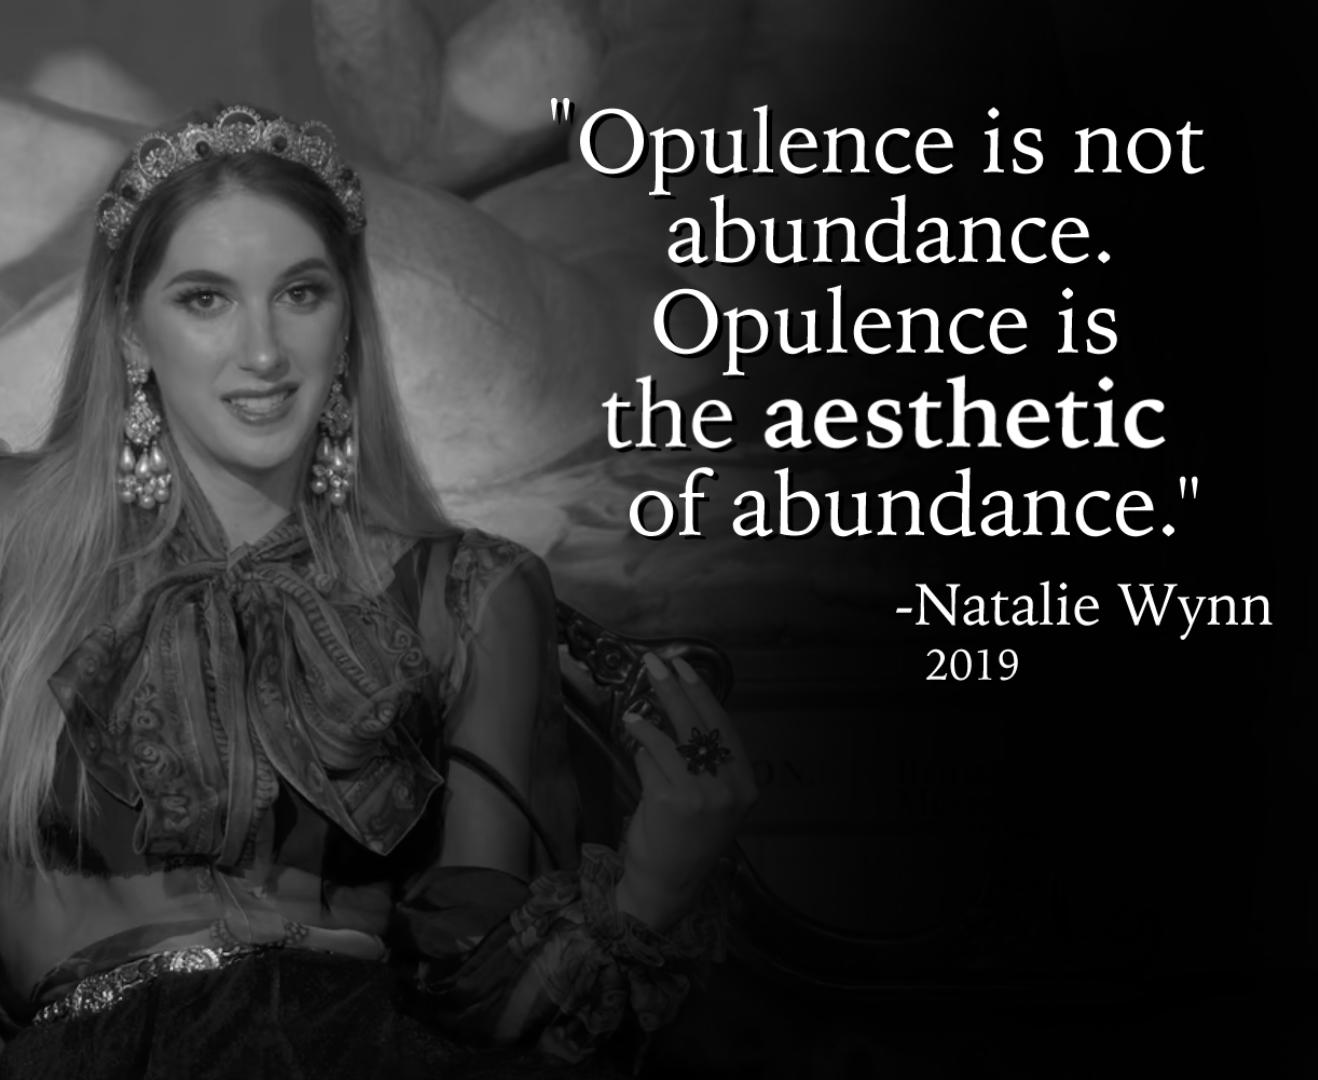 """Opulence is not abundance. Opulence is the AESTHETIC of abundance."" -Natalie Wynn [1318 × 1080]"